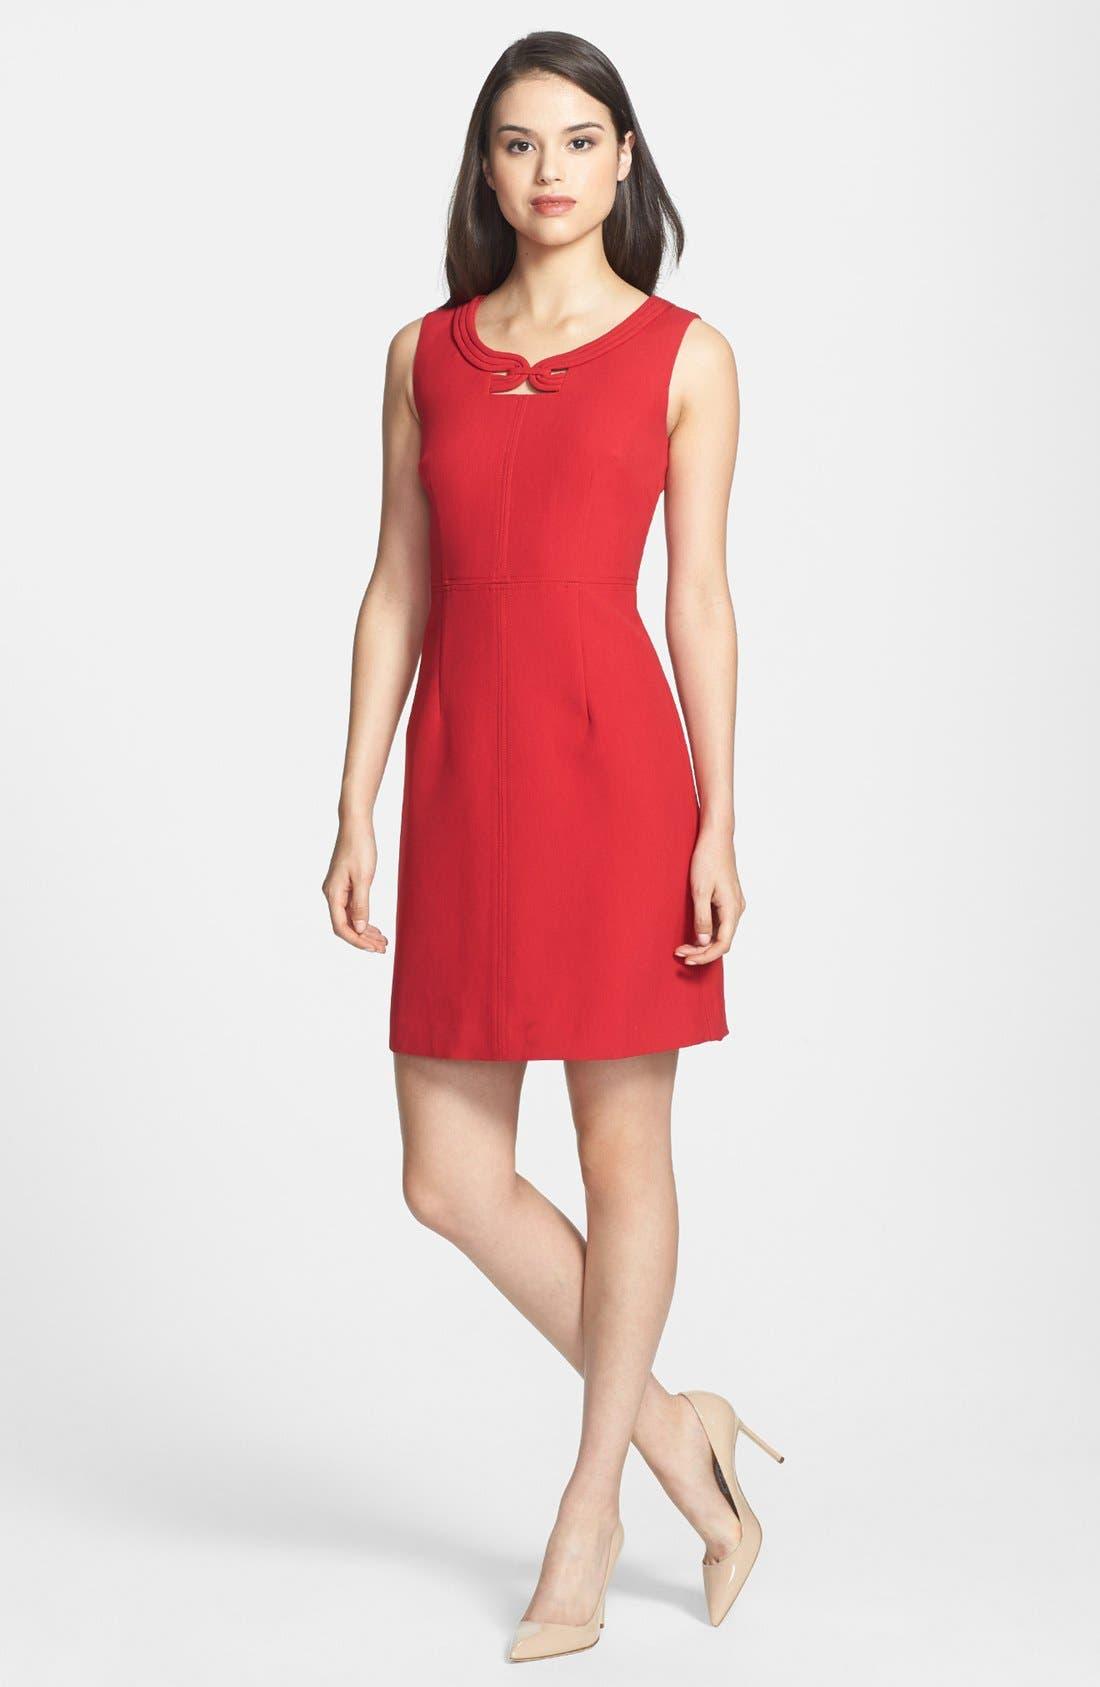 Alternate Image 1 Selected - Laundry by Shelli Segal Seamed Crepe Sheath Dress